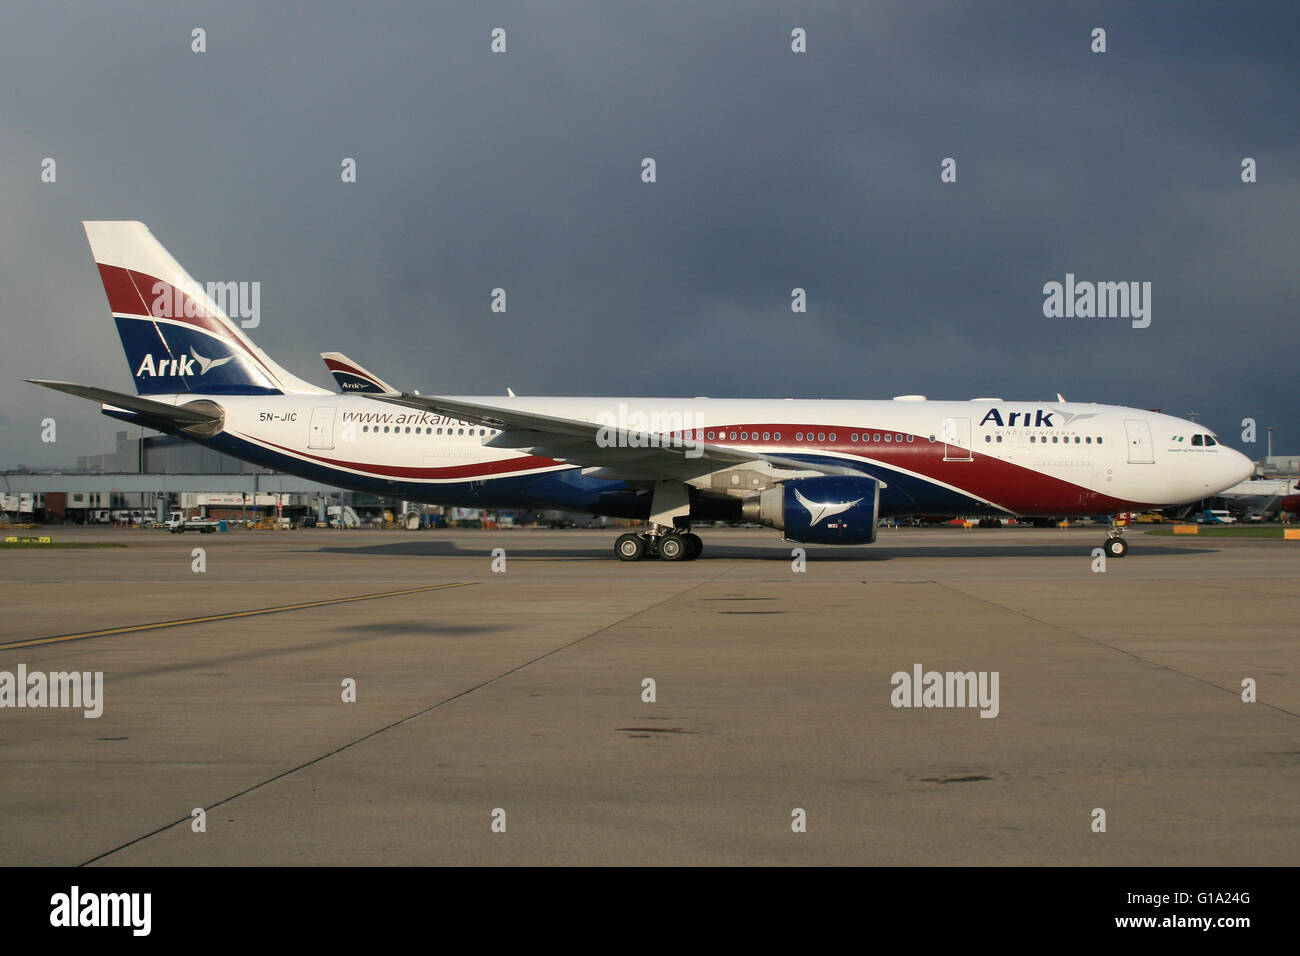 ARIK NIGERIA A330 - Stock Image